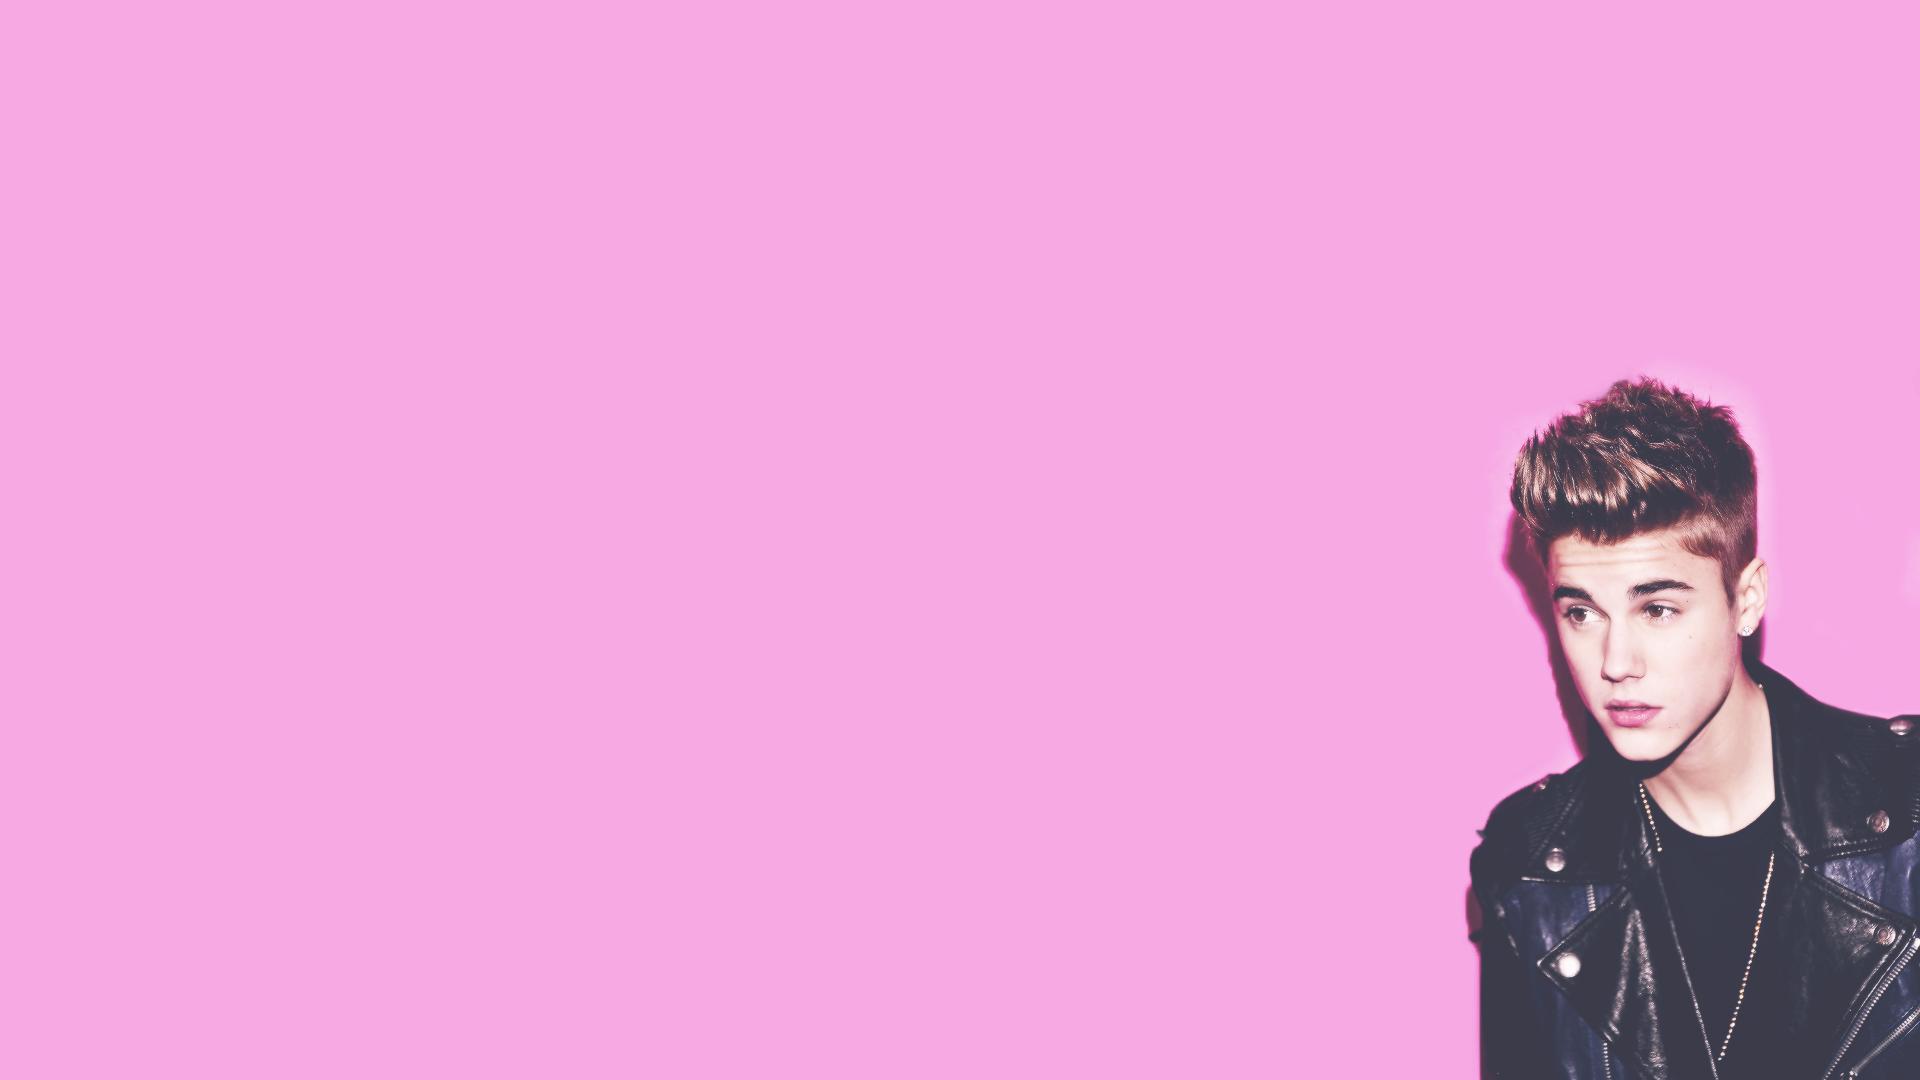 Justin Bieber Tumblr Backgrounds 2015 1920x1080